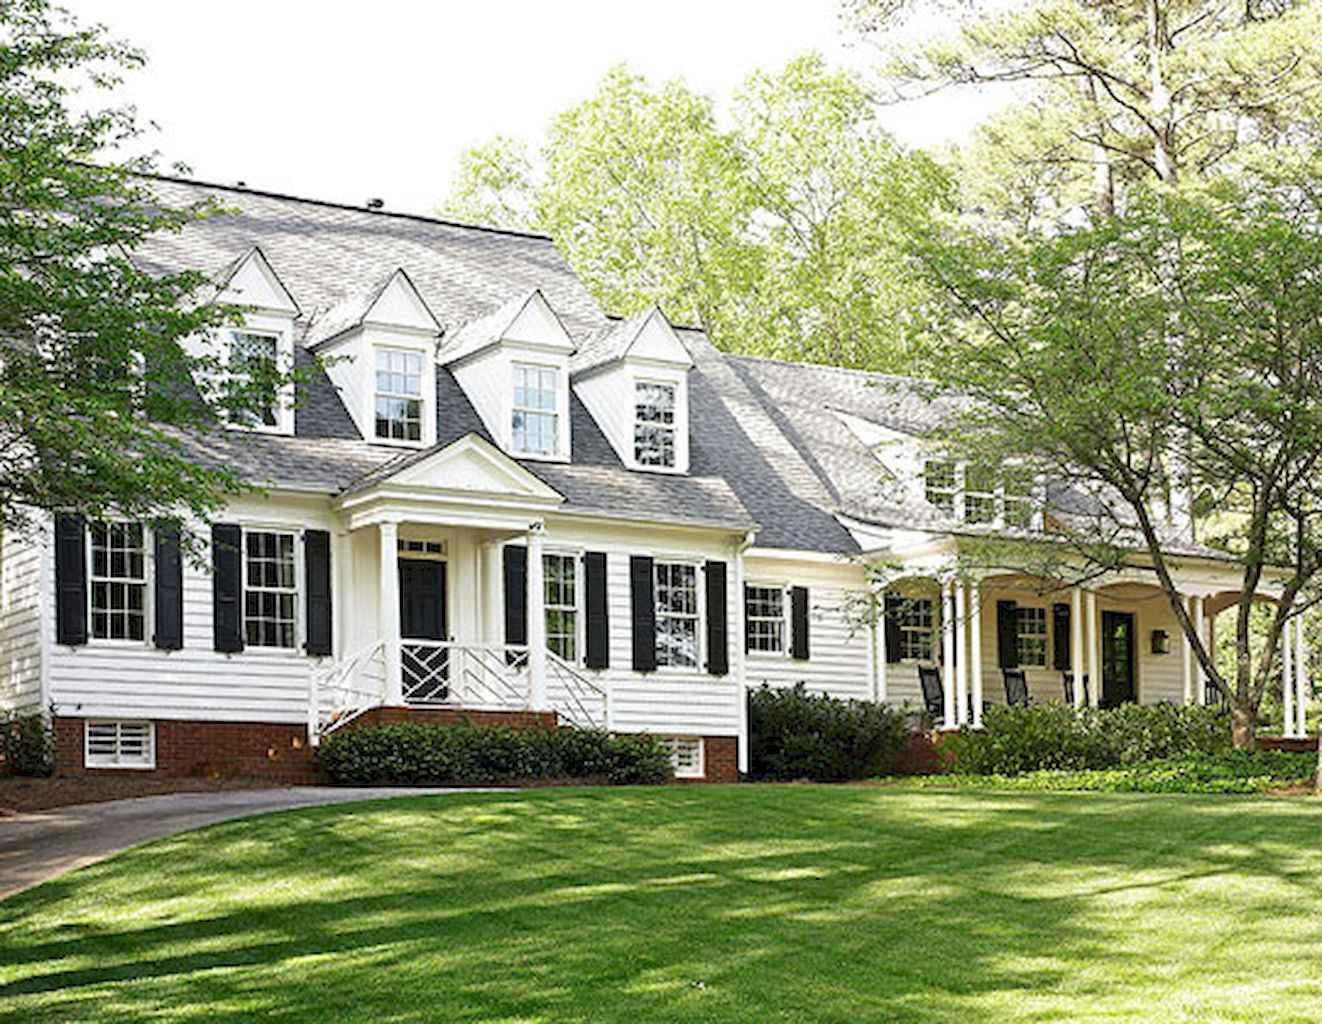 80 Amazing Plantation Homes Farmhouse Design Ideas (21)